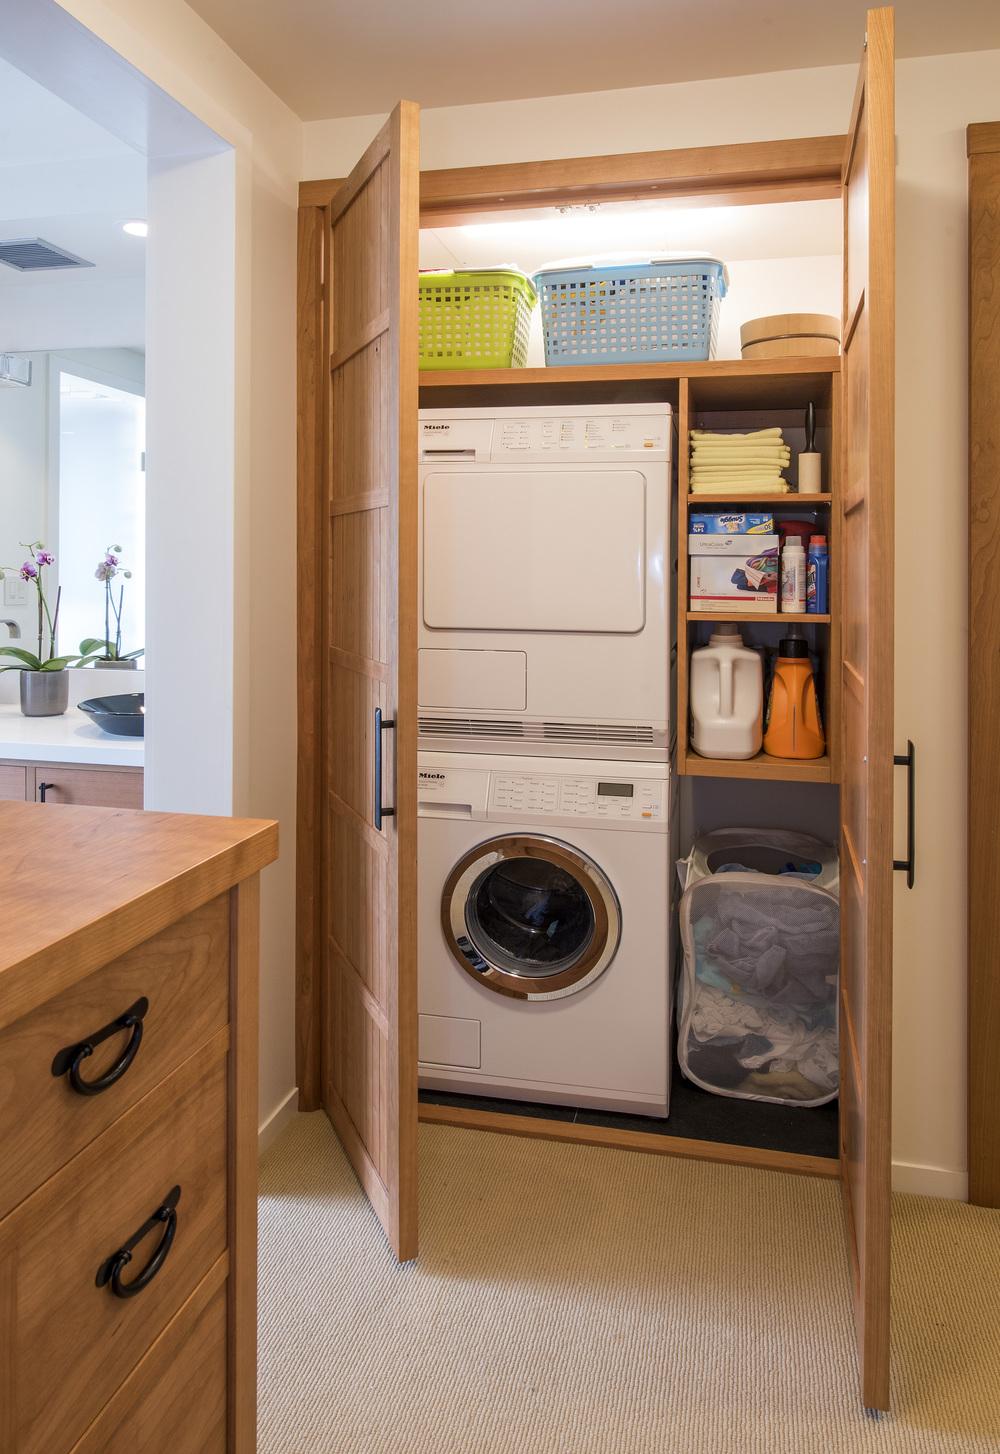 5 crop Laundry Closet DSC_4637.jpg